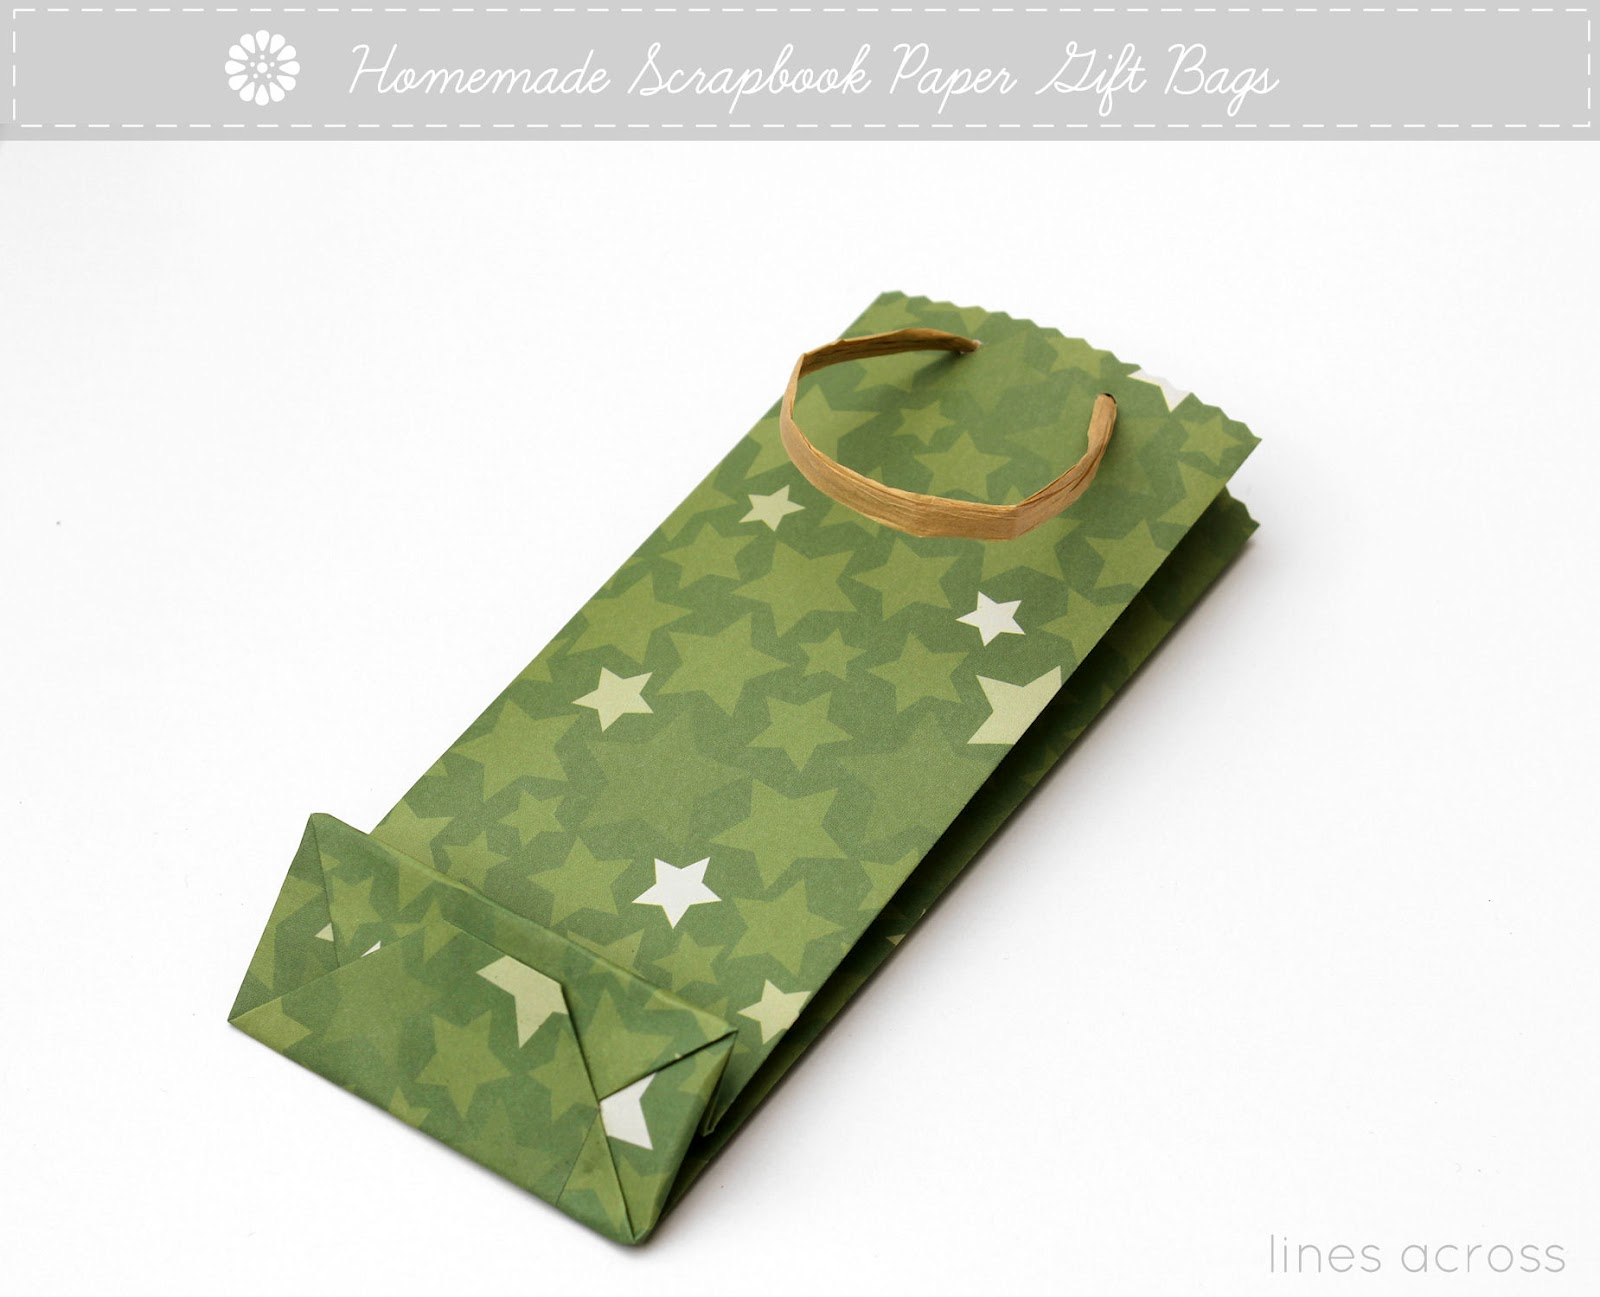 Homemade Scrapbook Paper Gift Bags Lines Across